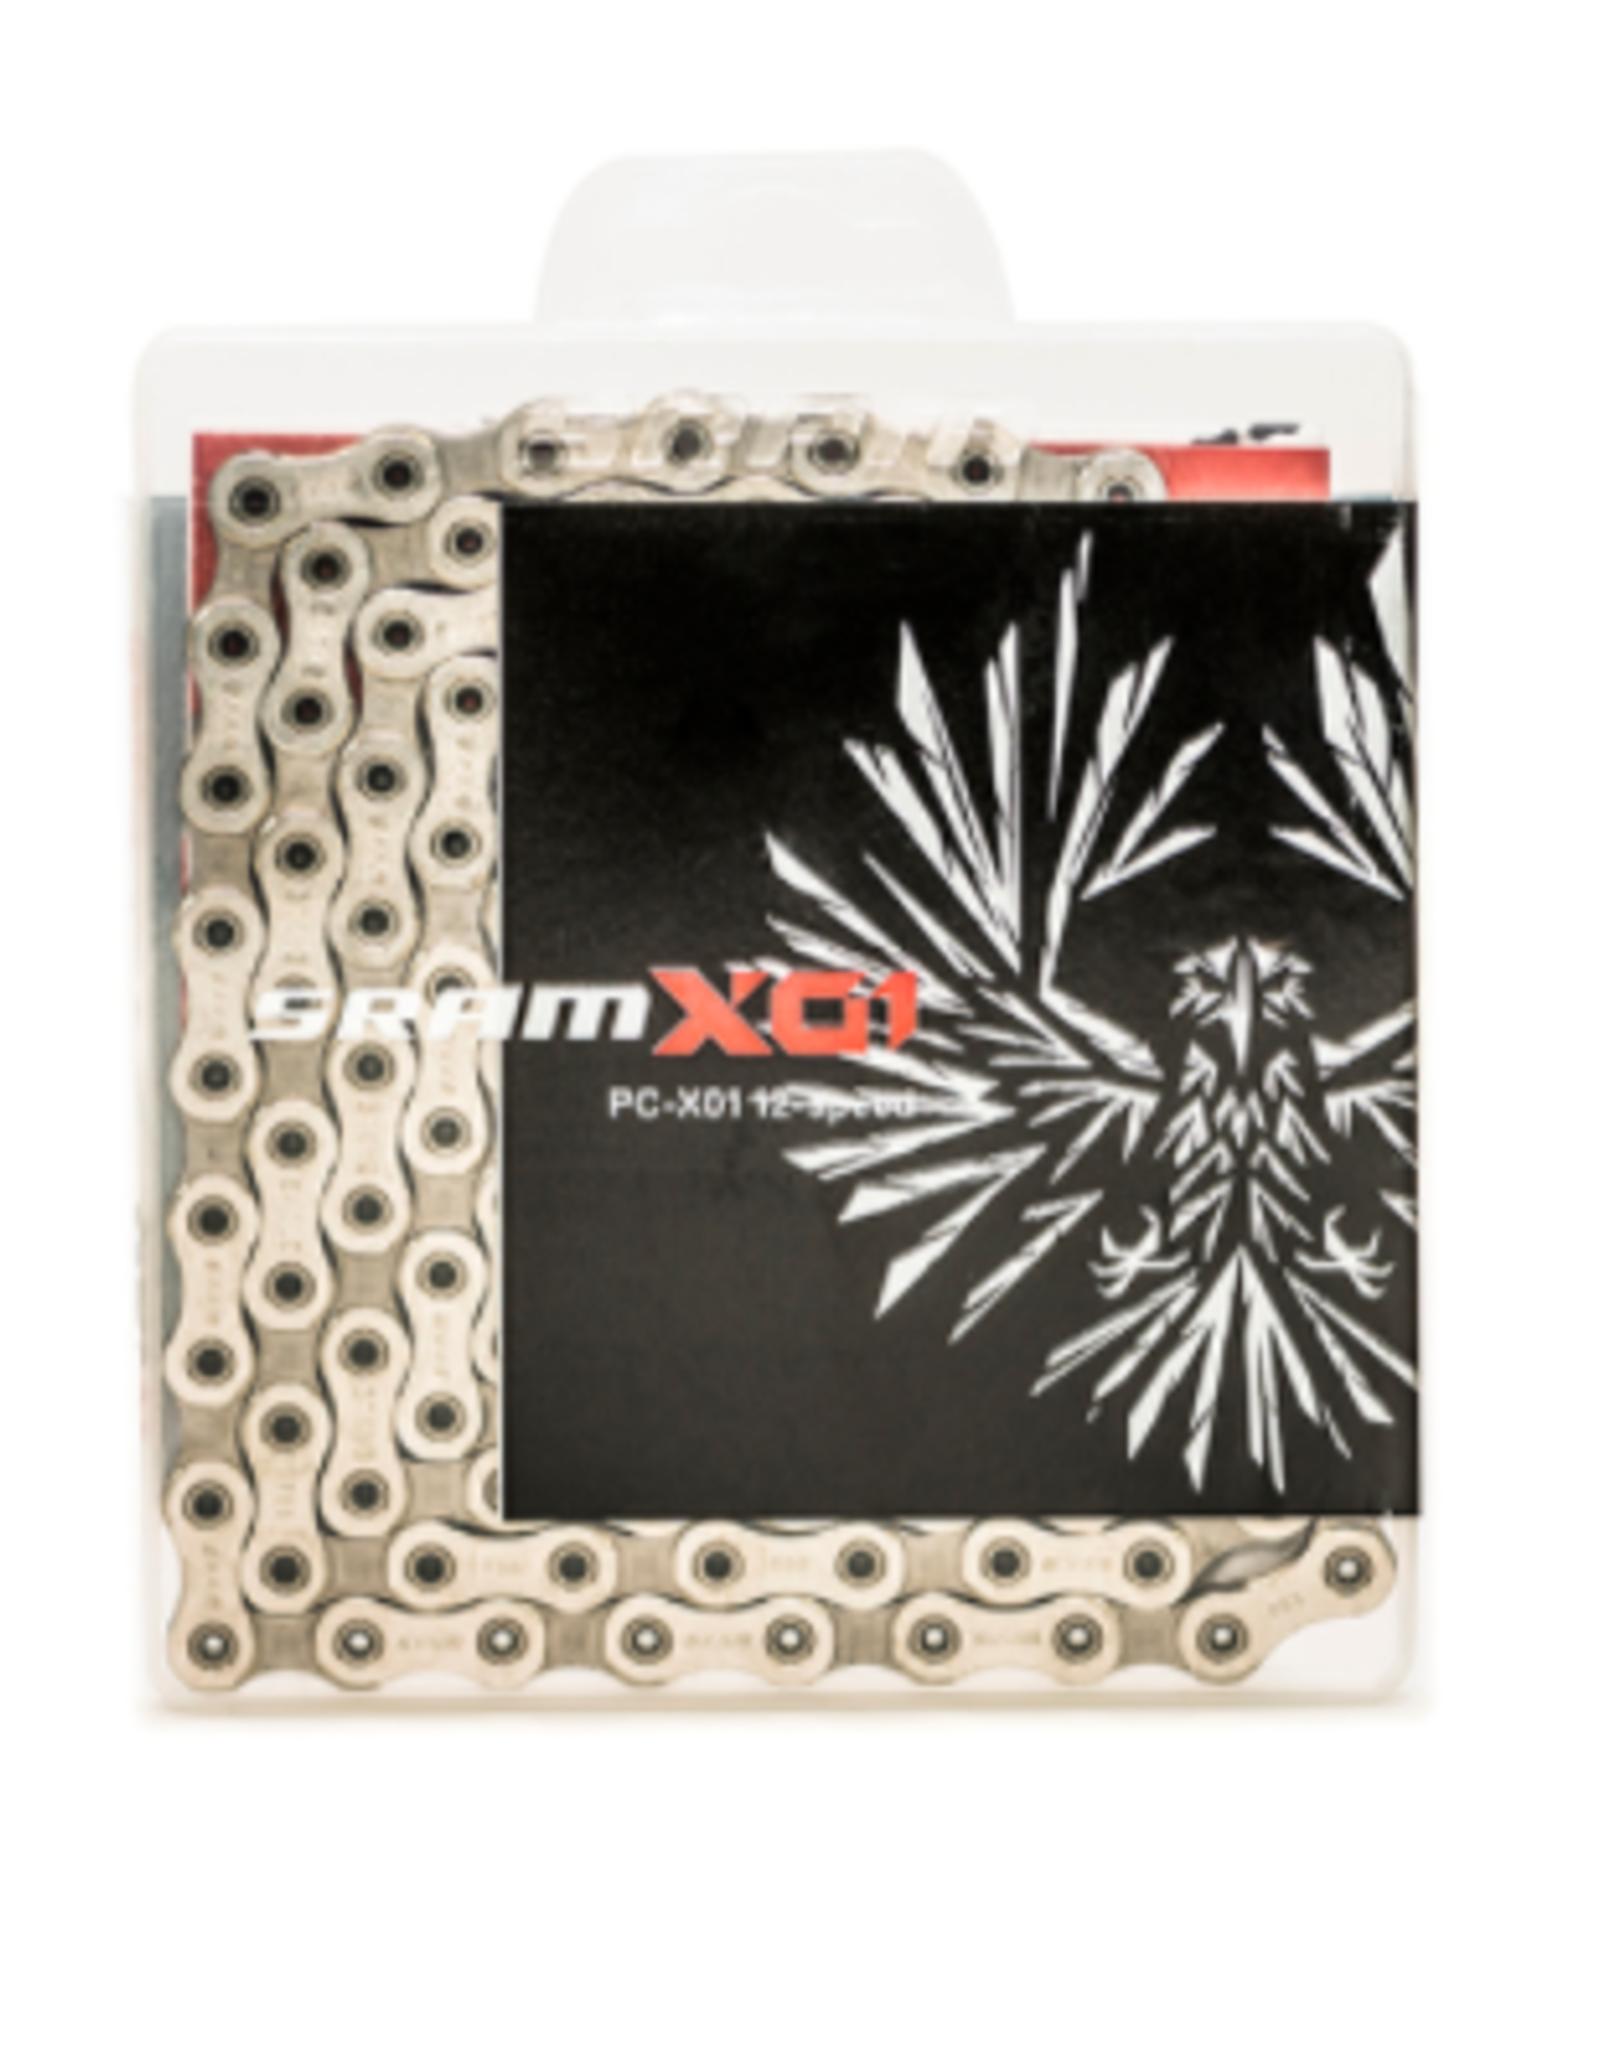 srAM Sram X01 Eagle 12 Speed Chain